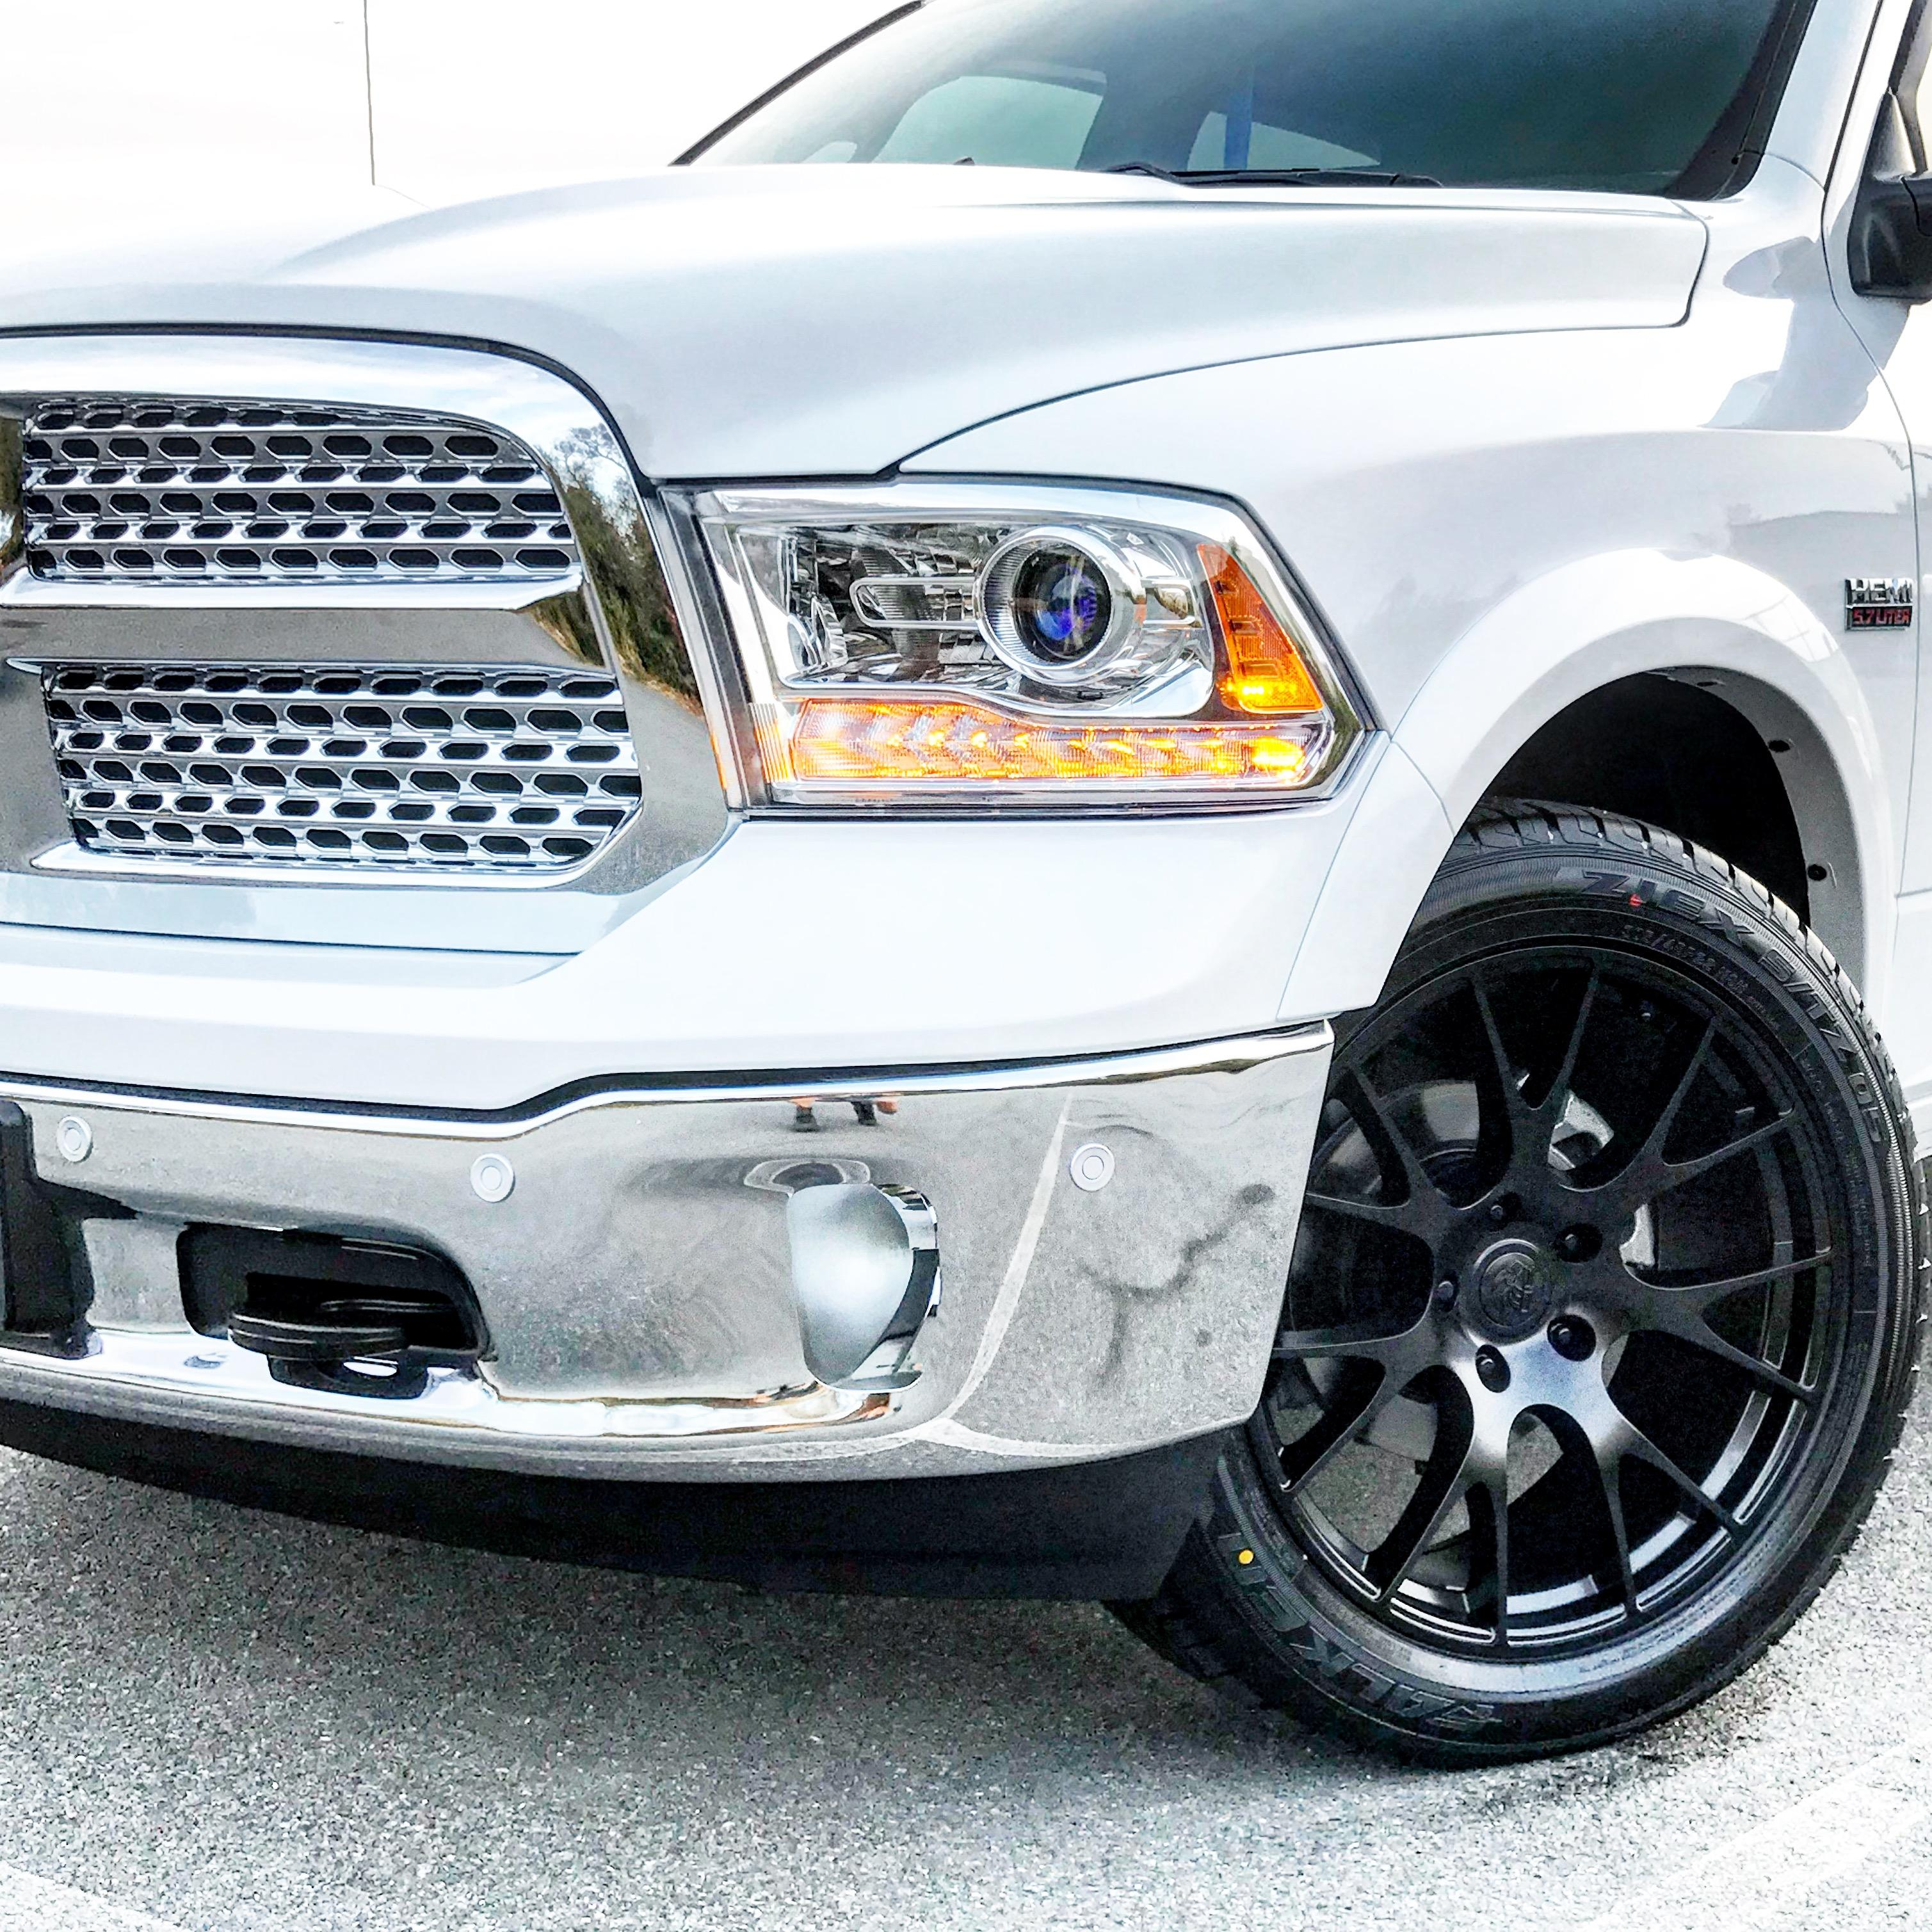 Dodge Ram With 22 Inch Rims >> DG69 22 inch satin black rims fits Ram 1500 (Hellcat style)